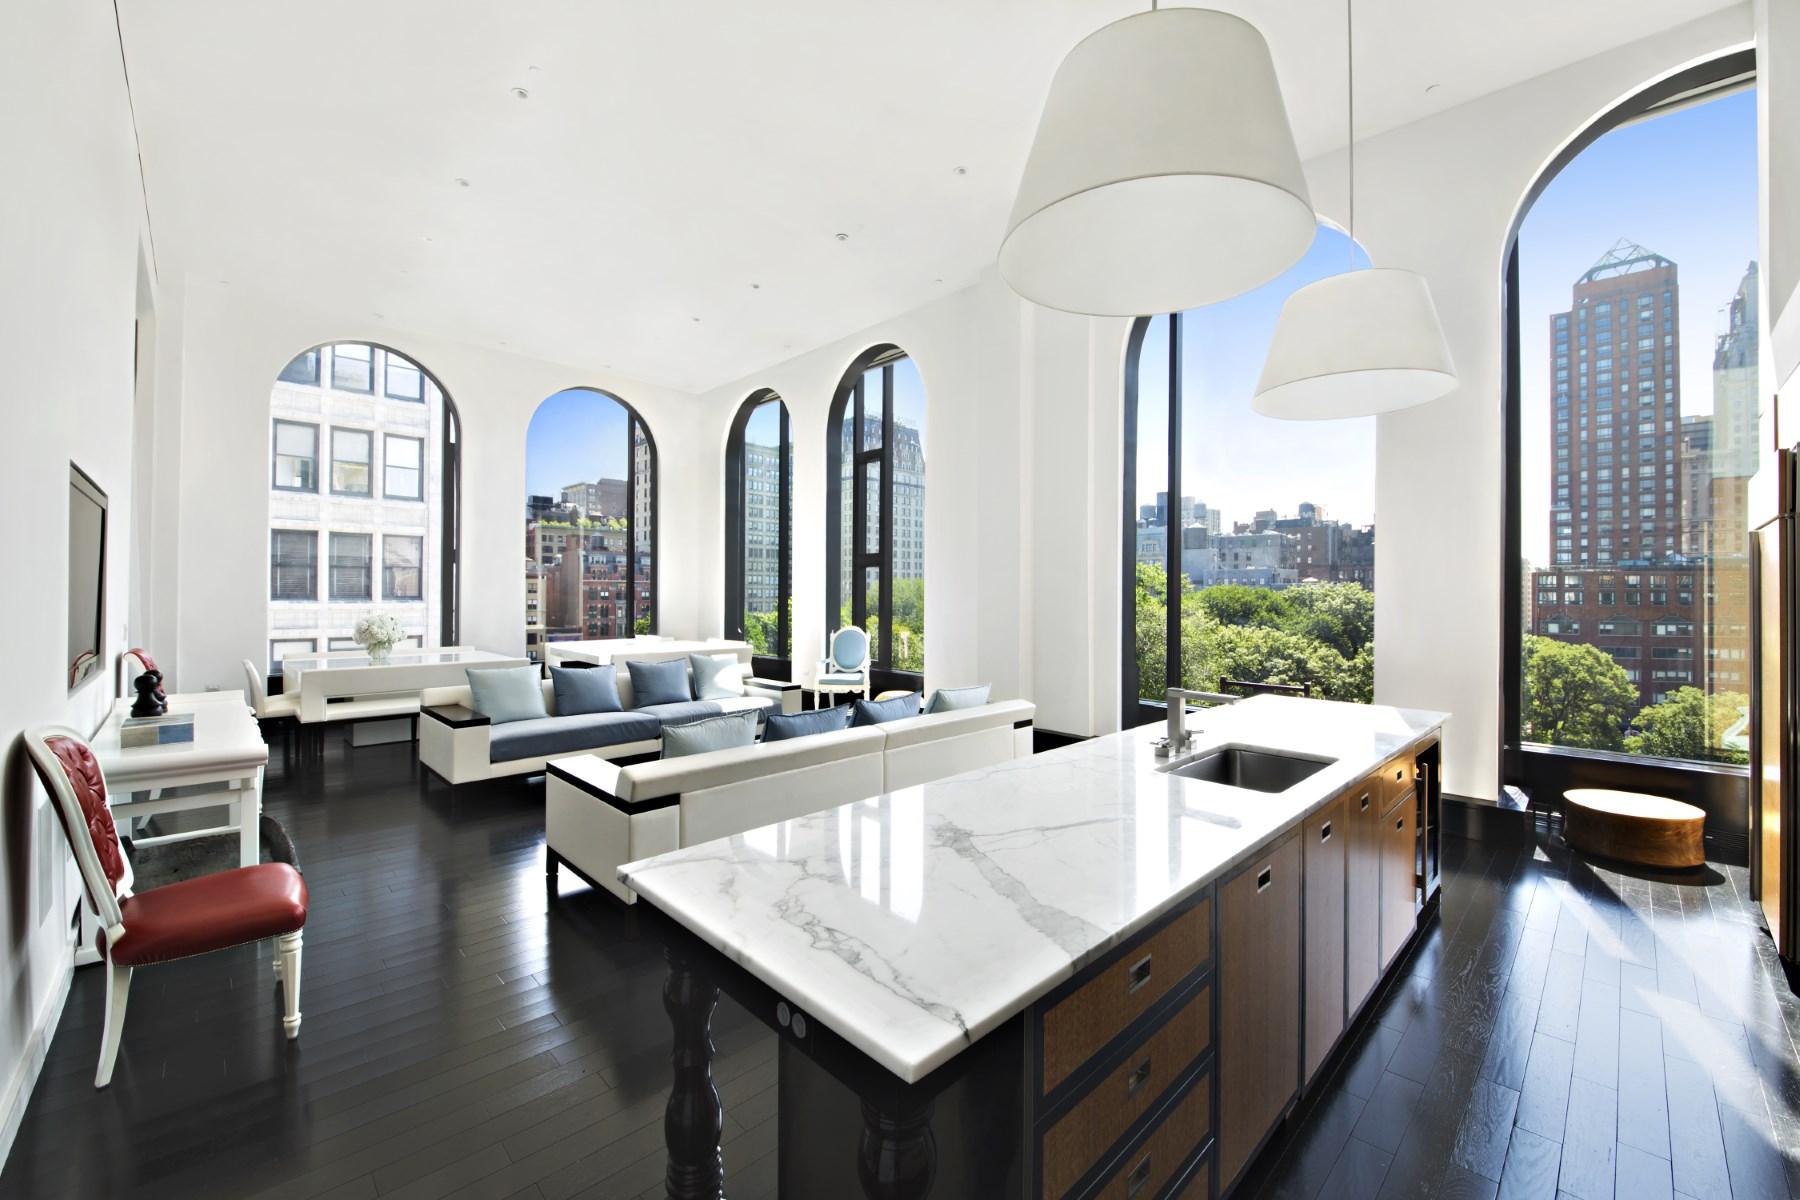 Condominium for Rent at 16' High Windows on Park, 15 Union Sq W 15 Union Square West Apt 6b New York, New York 10003 United States